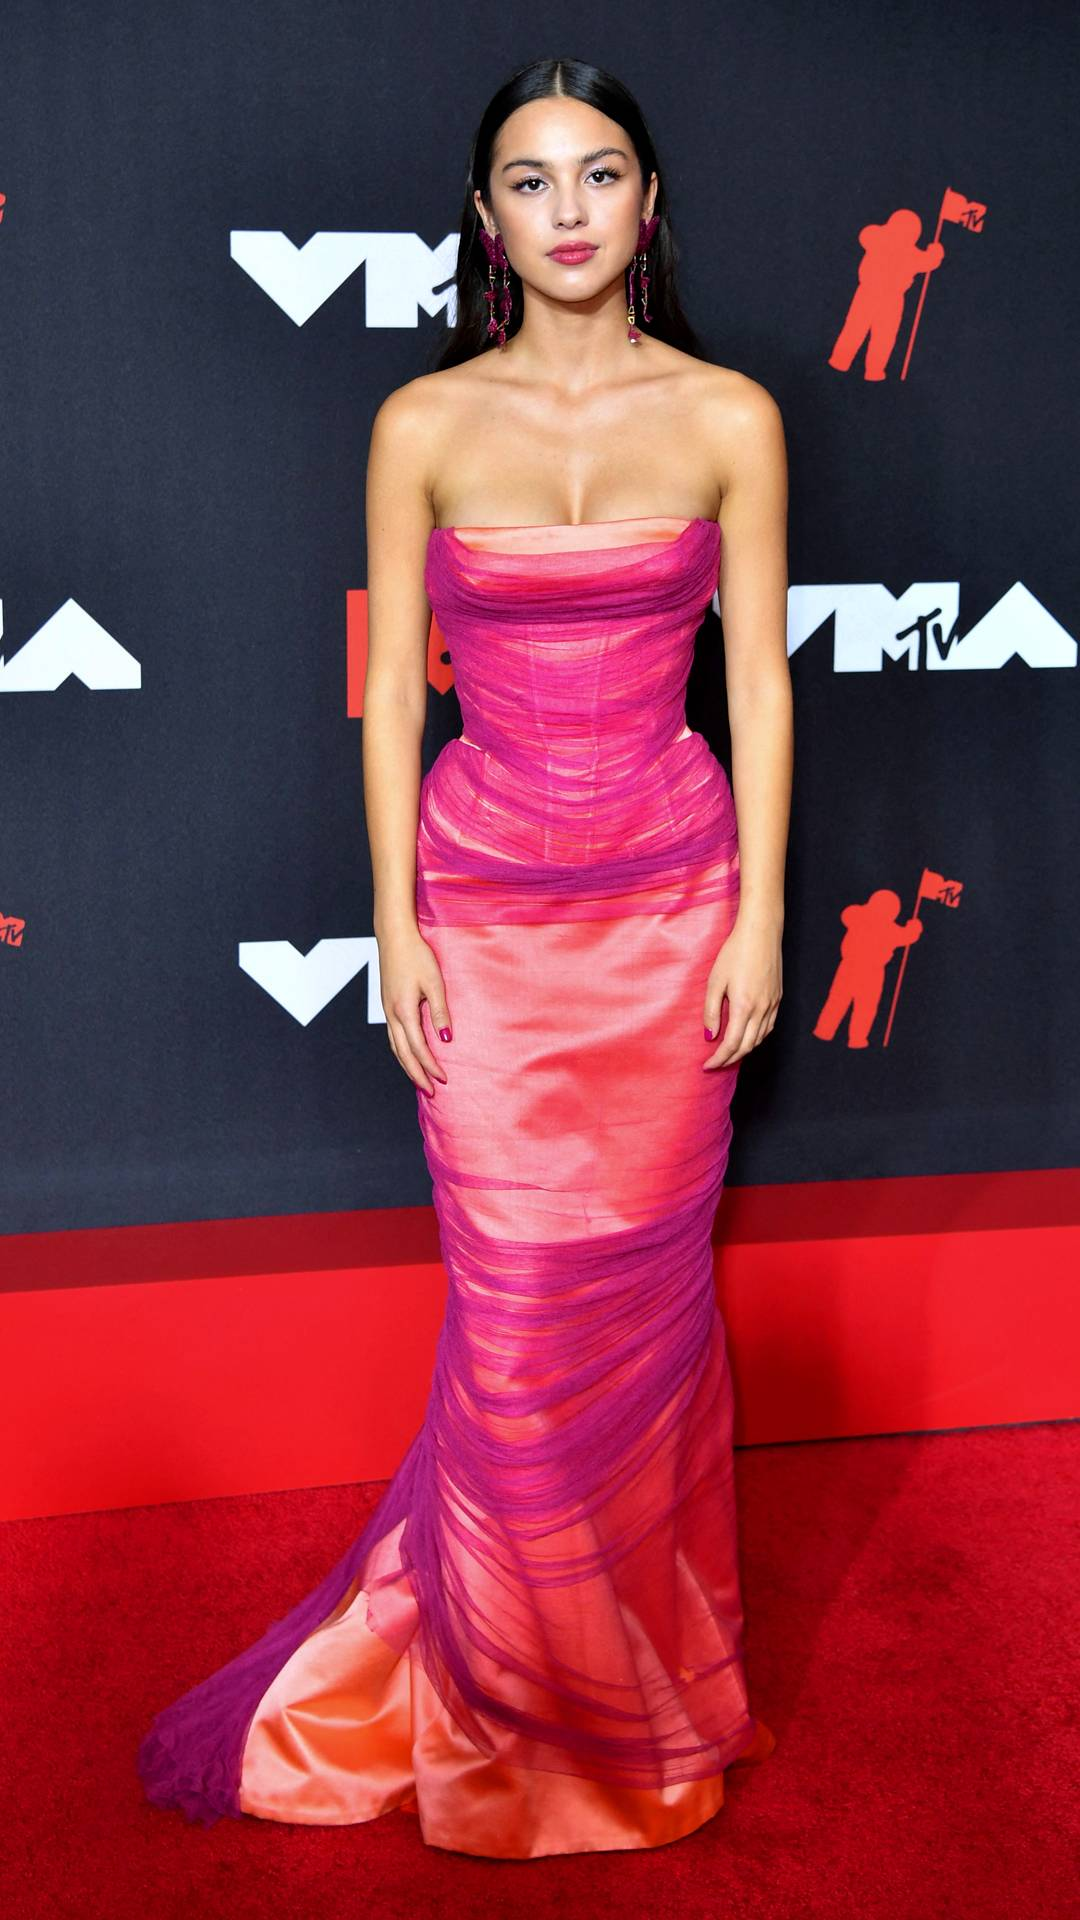 MTV Video Music Awards 2021 | The Best of the VMAs 2021 Red Carpet | Olivia Rodrigo | 1080x1920